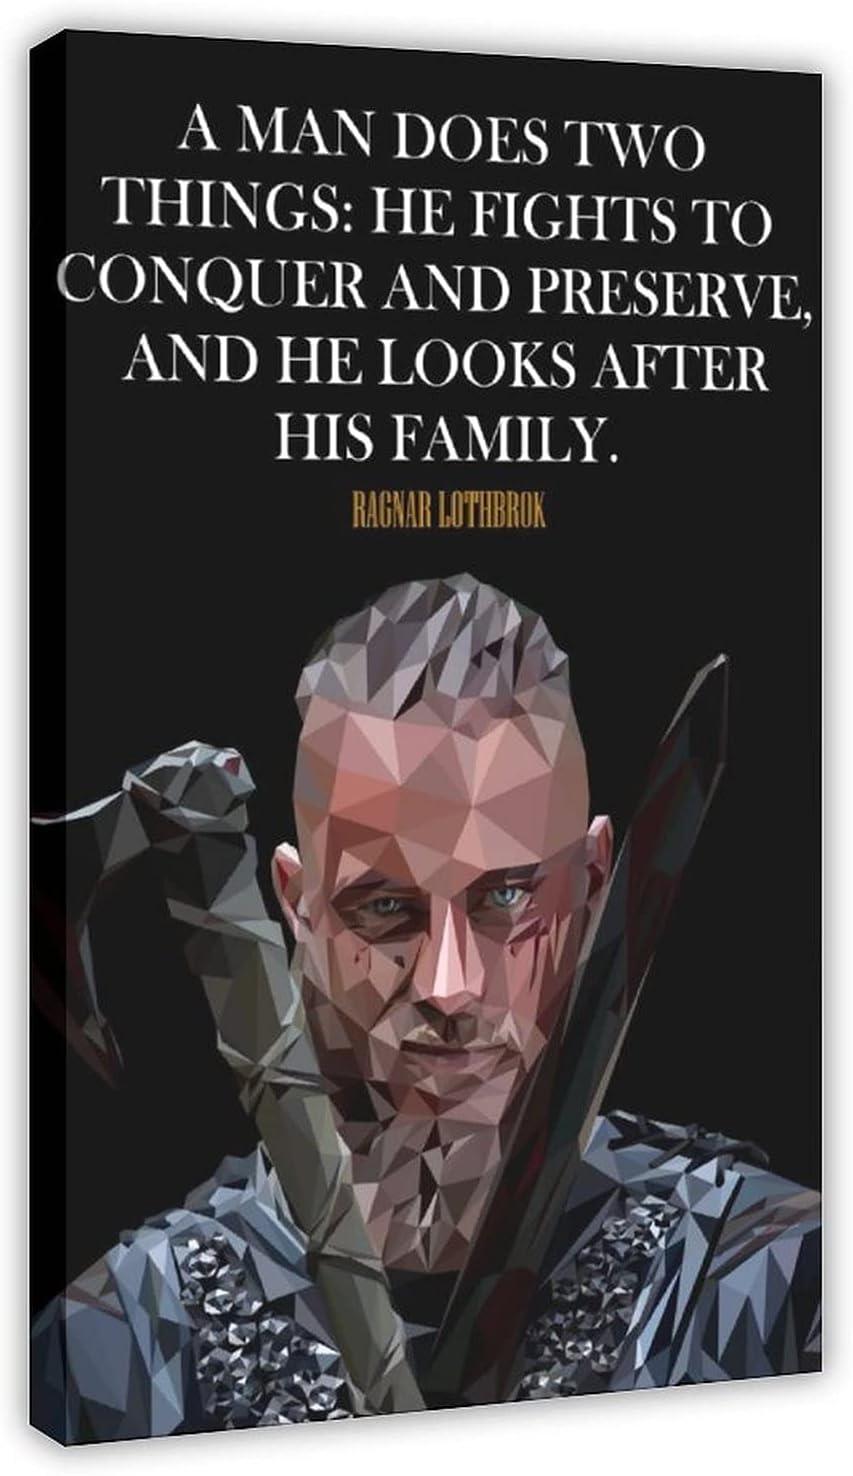 Vikings TV Show Ragnar Alternative dealer Credence Lothbrok Vintage Movie 2 C Classic Poster